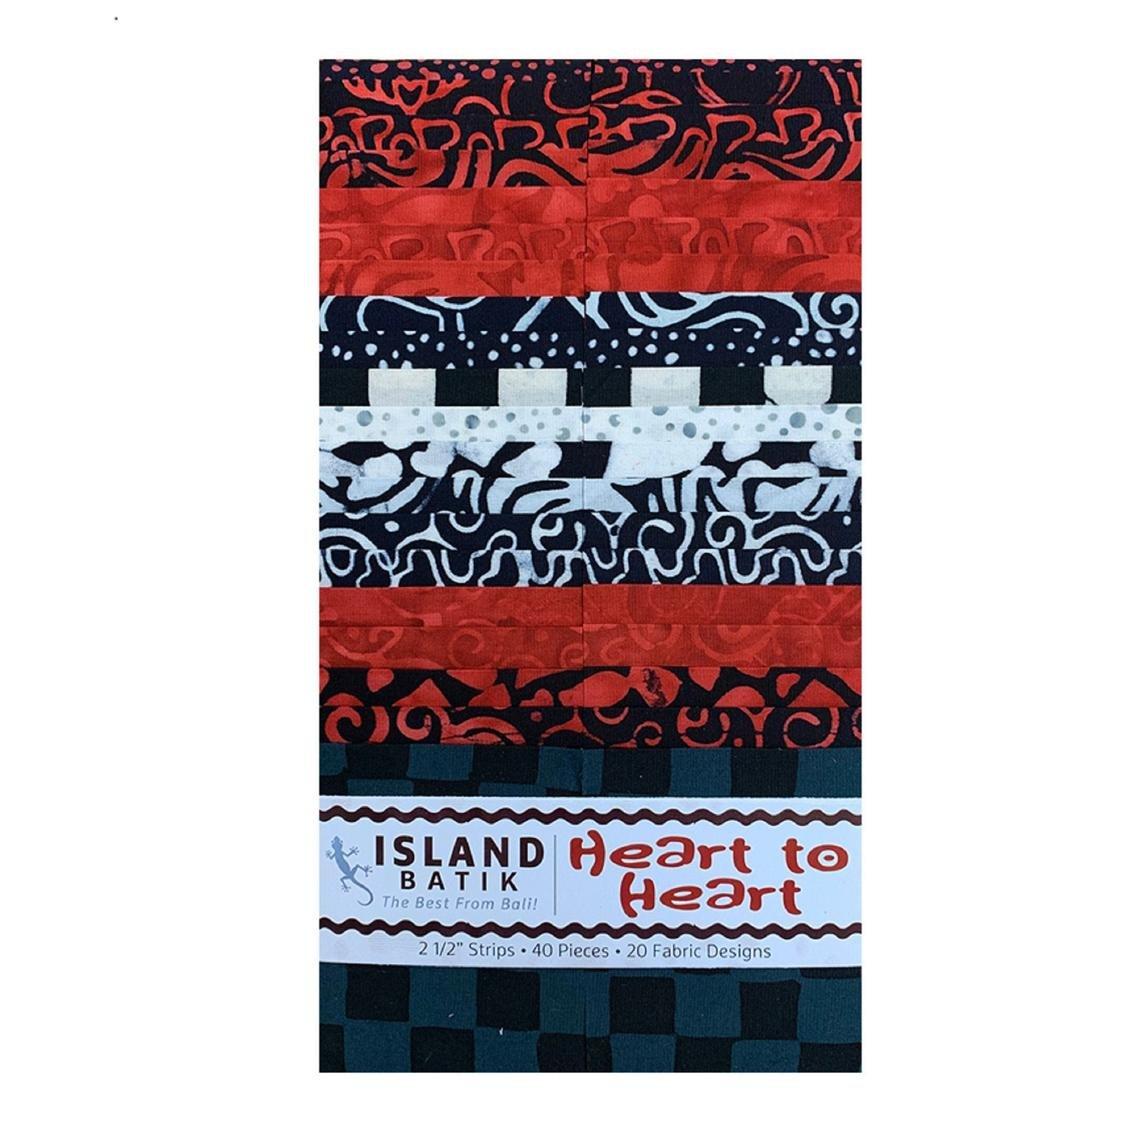 Heart to Heart Batik Strip Pack